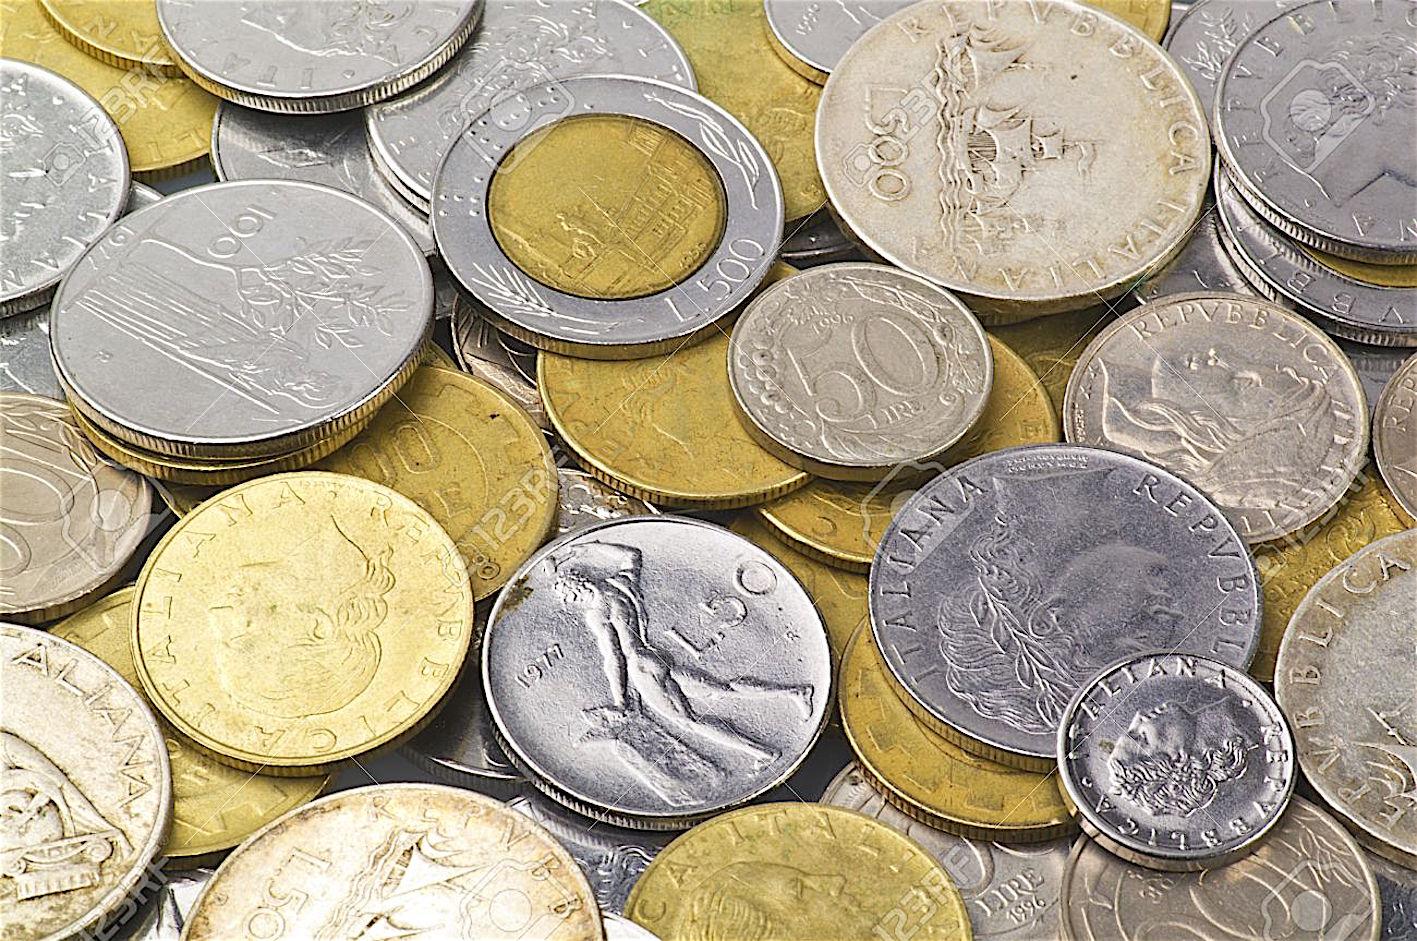 moneta-lira-italiana-storia